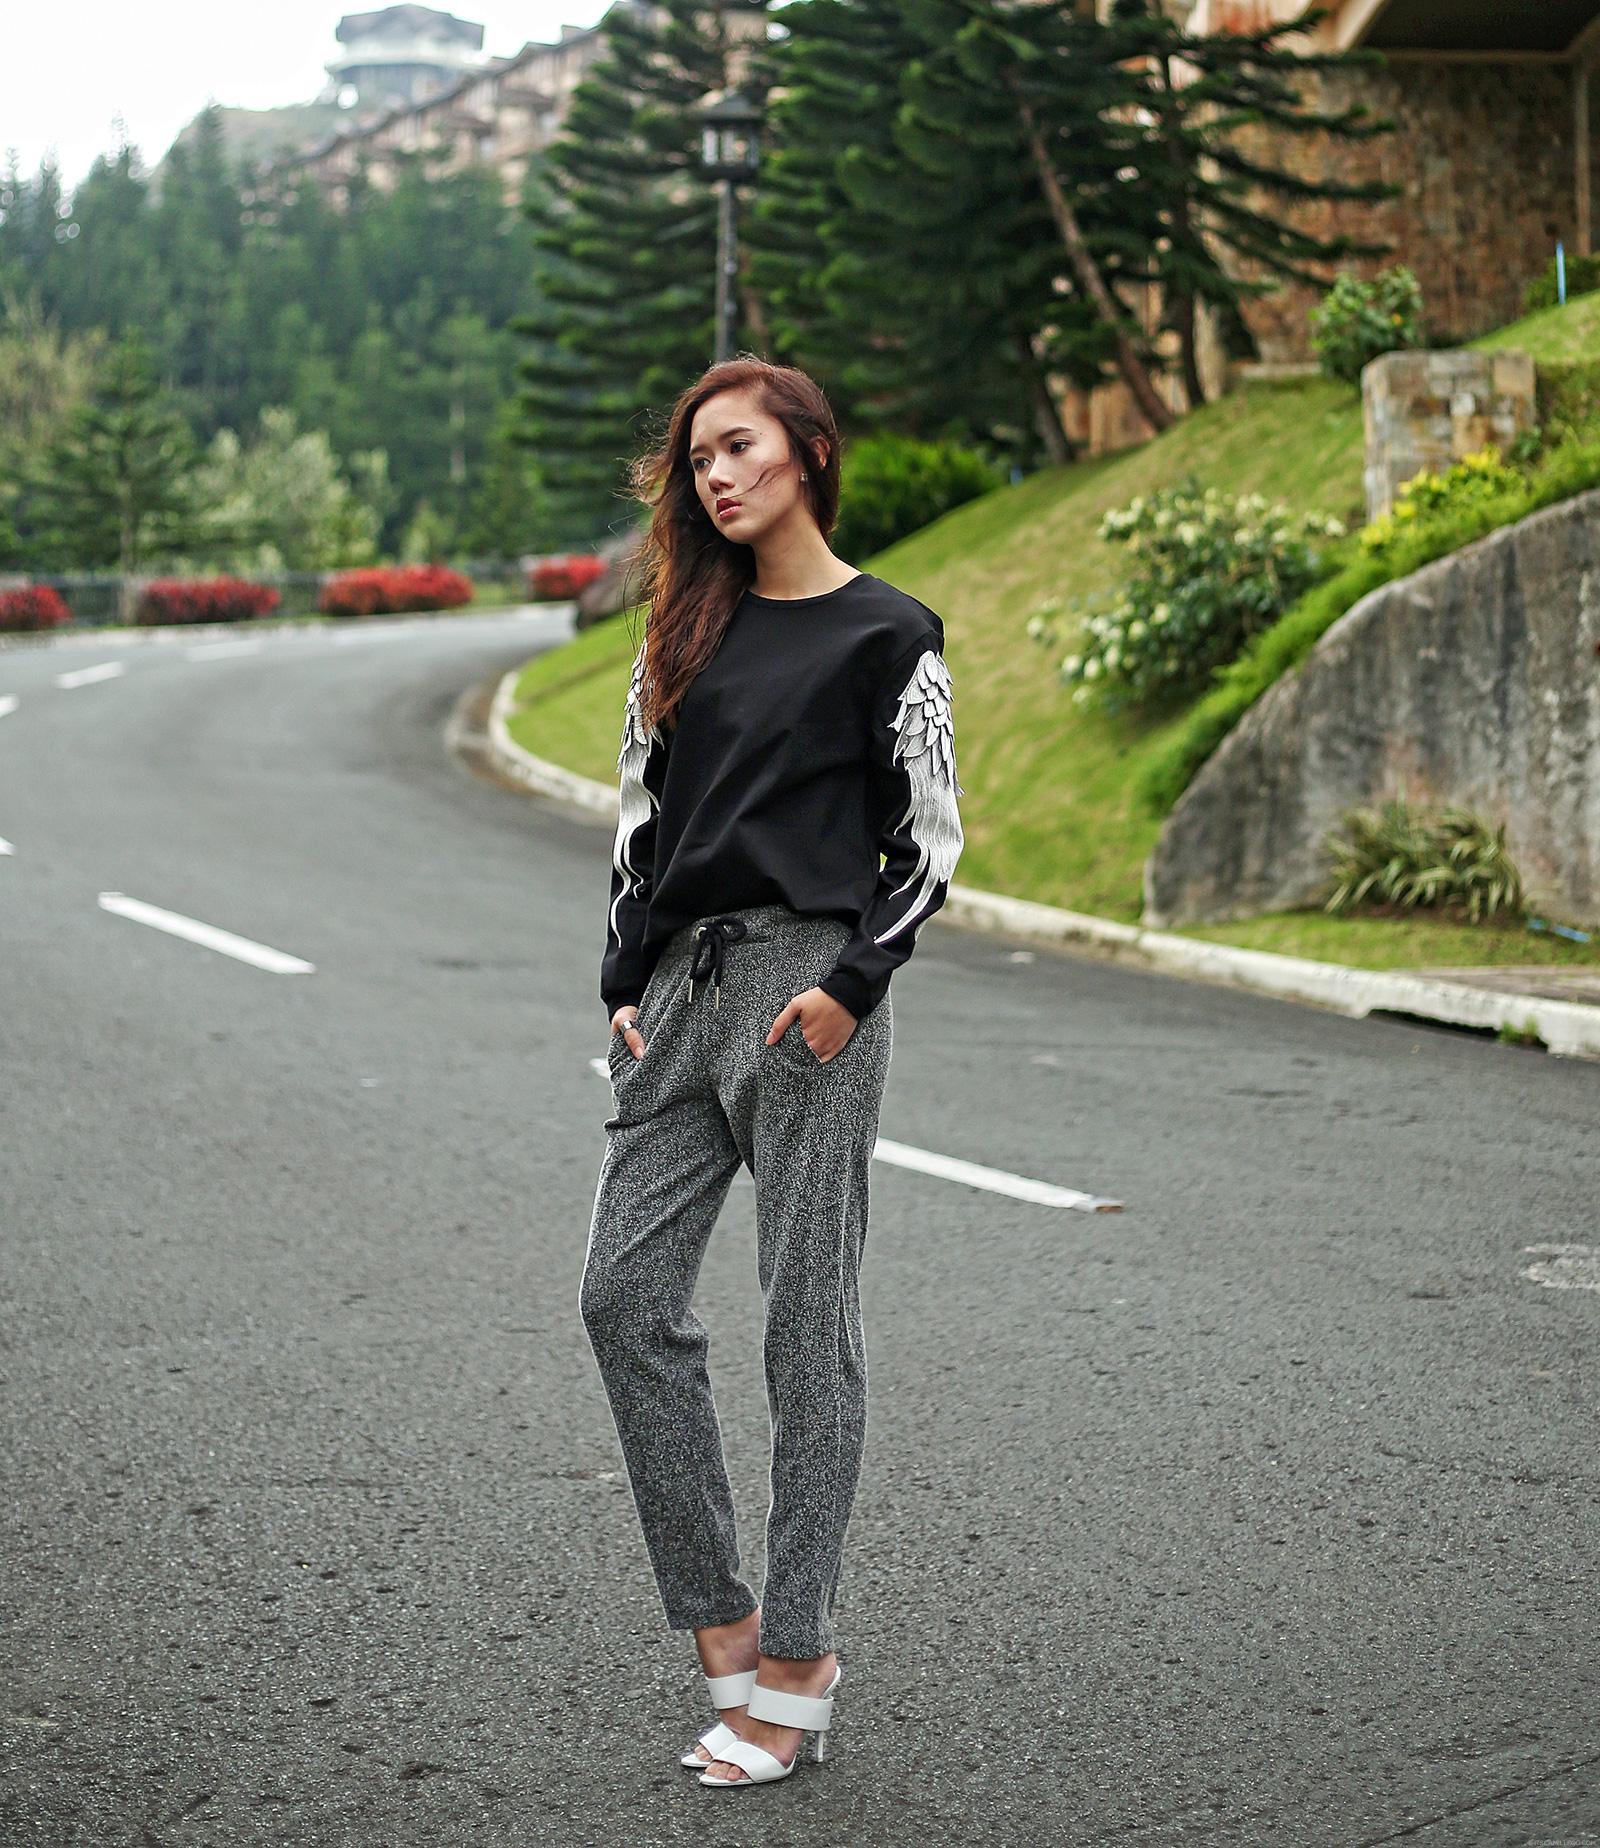 Ji Cheng Sweater, ZARA joggers, Alexander Wang heels | www.itscamilleco.com